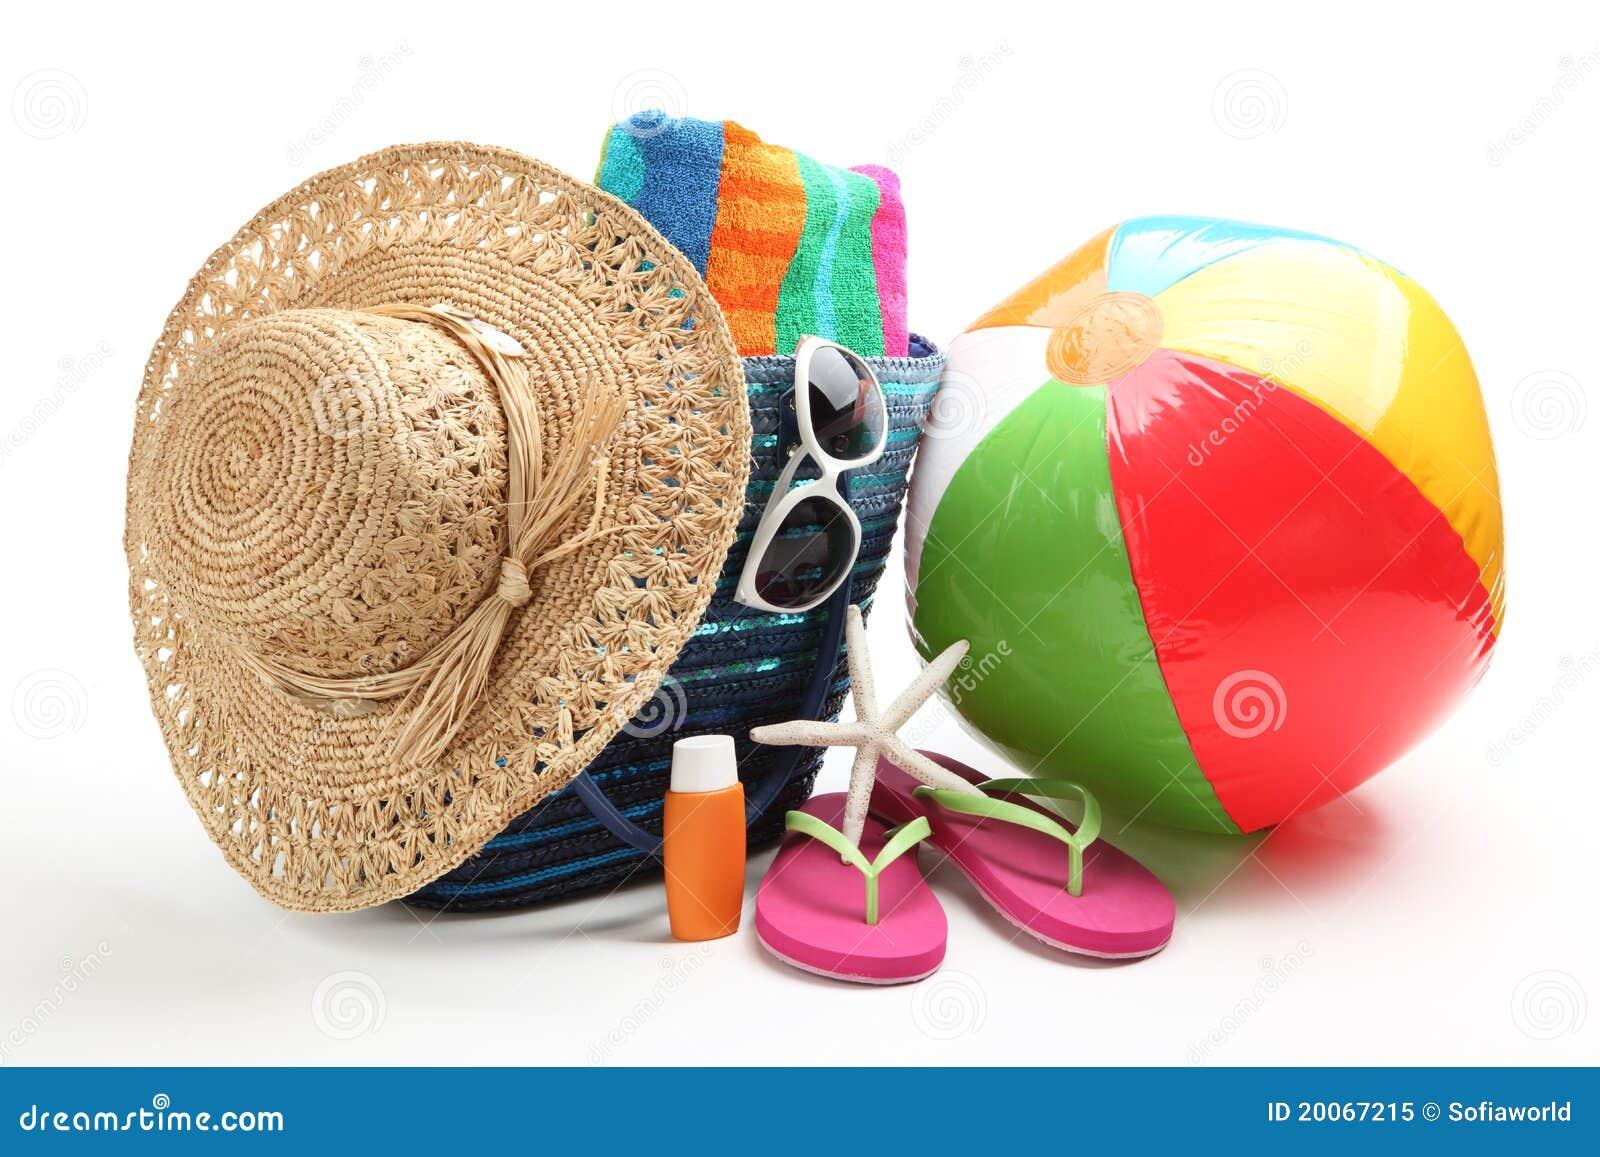 Beach Items Color Umbrella Ball And Lifesaver Stock Photography